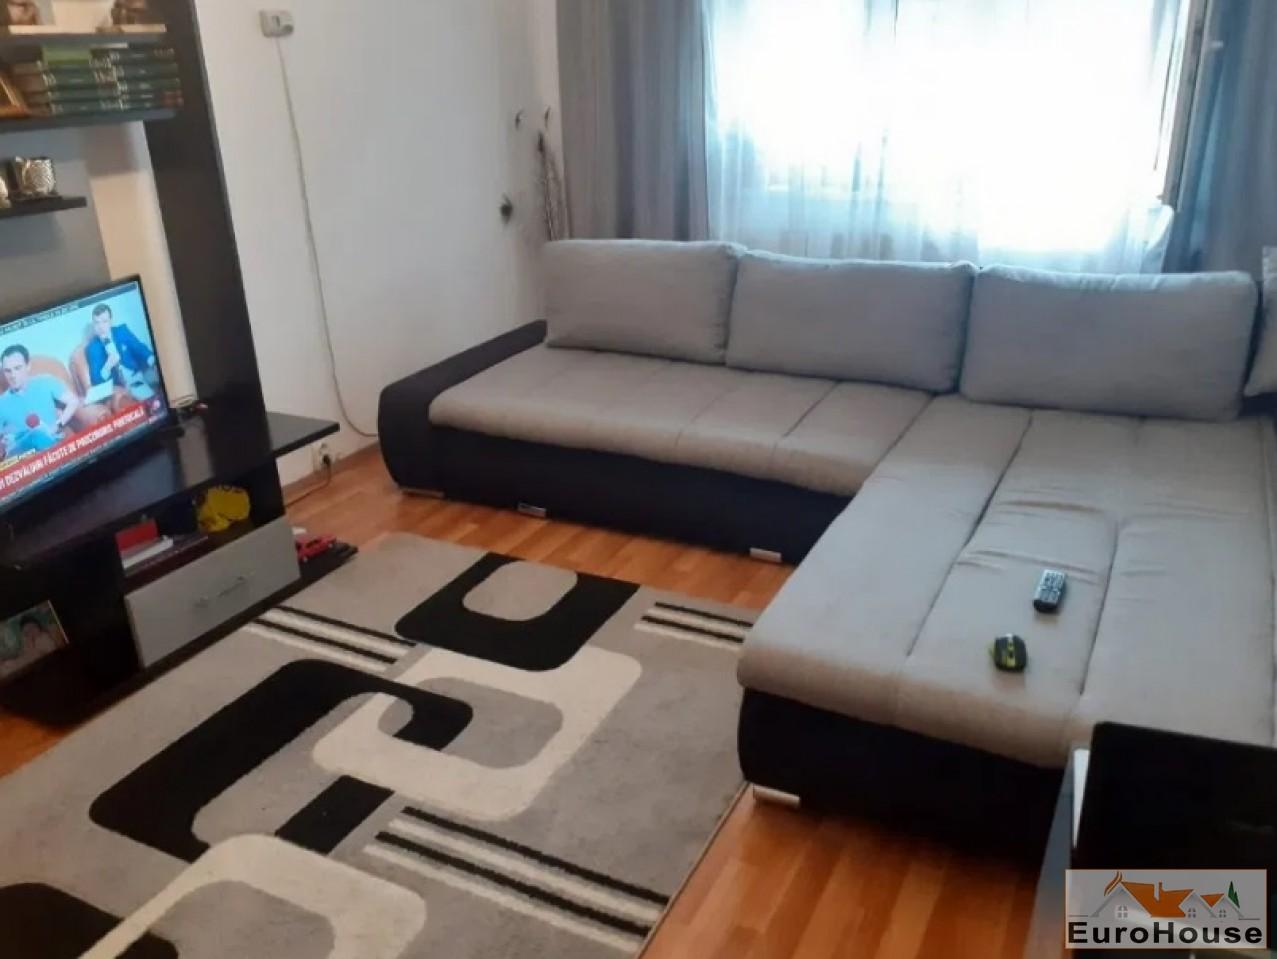 Apartament 3 camere de vanzare Alba Iulia -34537-